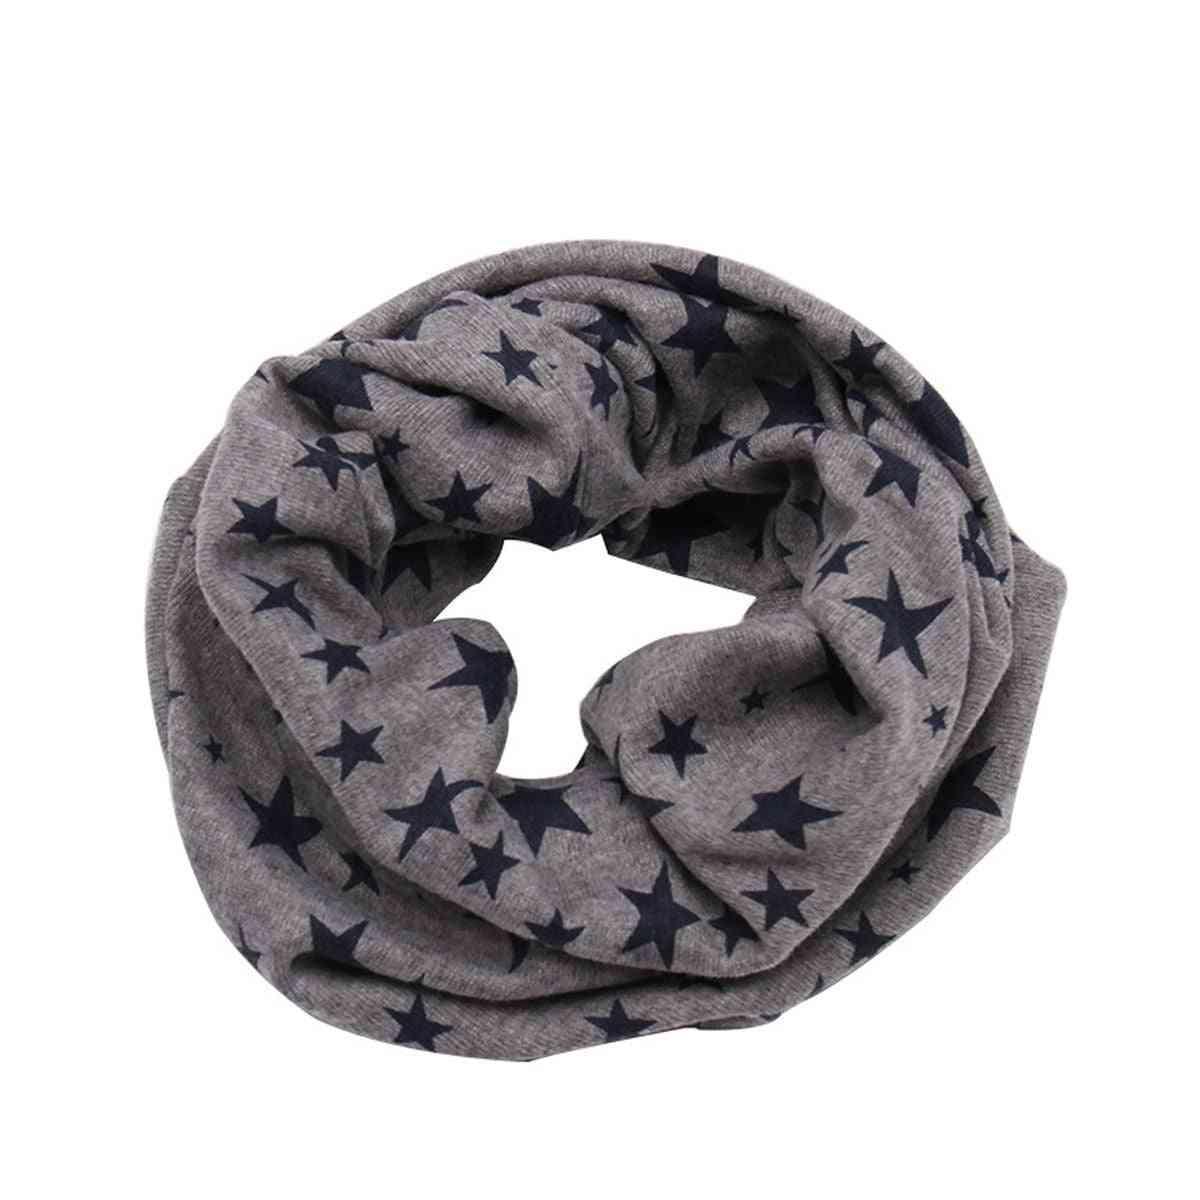 Infant / Winter Warm Neckerchief Stars Print Scarves